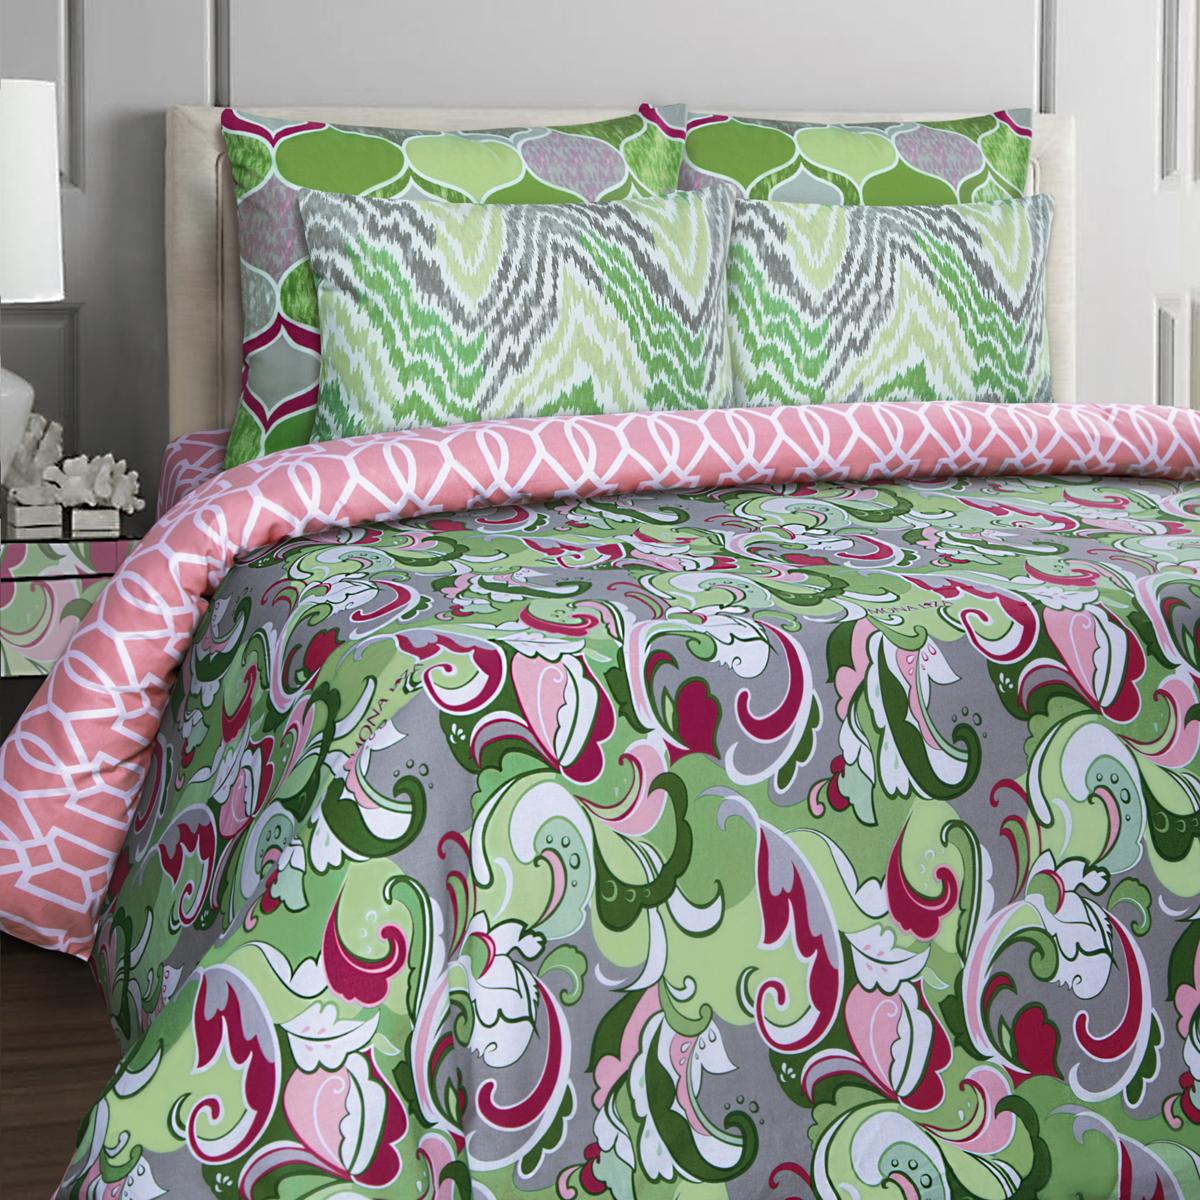 Комплект белья Mona Liza Stone Rubin, 1,5-спальный, наволочки 70x70. 551114-59 комплект белья mona liza stone topaz 1 5 спальный наволочки 70x70 551114 63